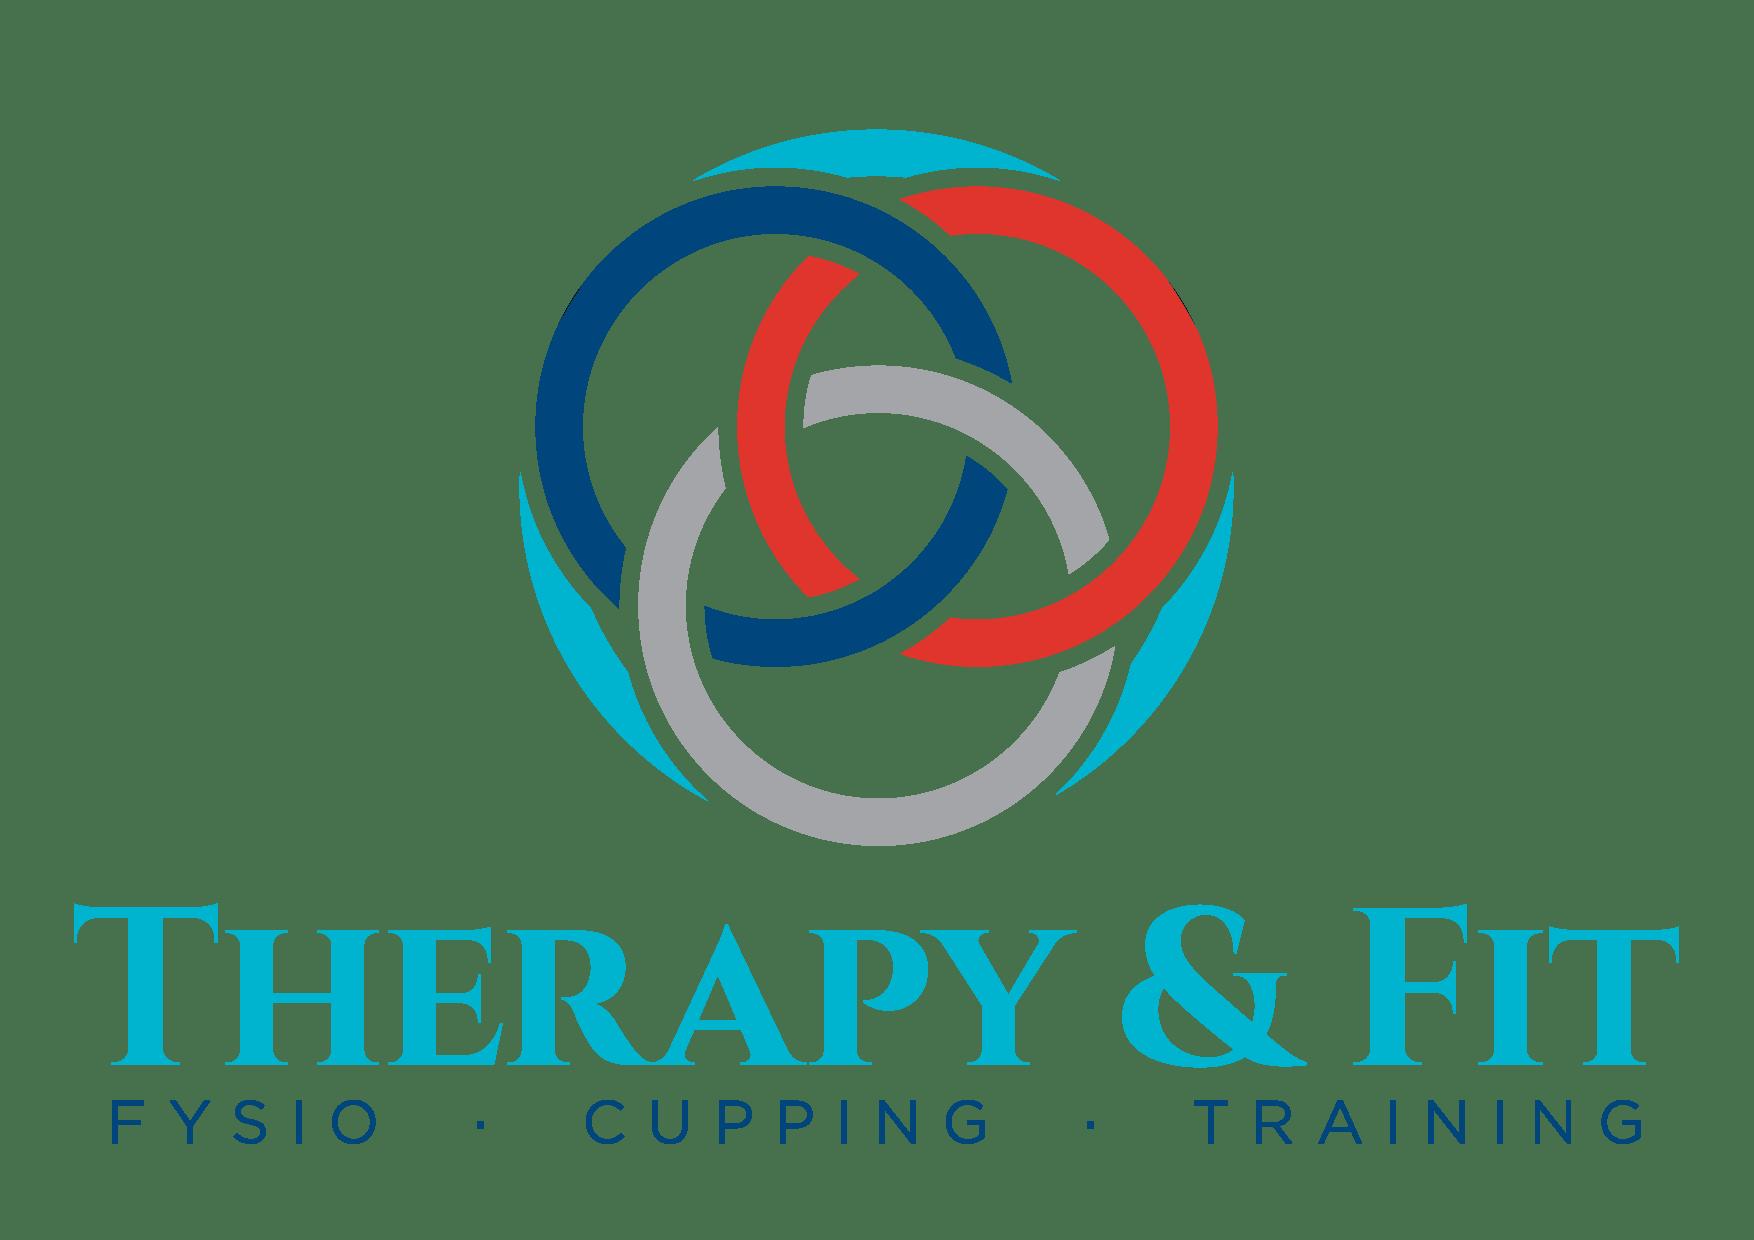 Fysiotherapie Veghel